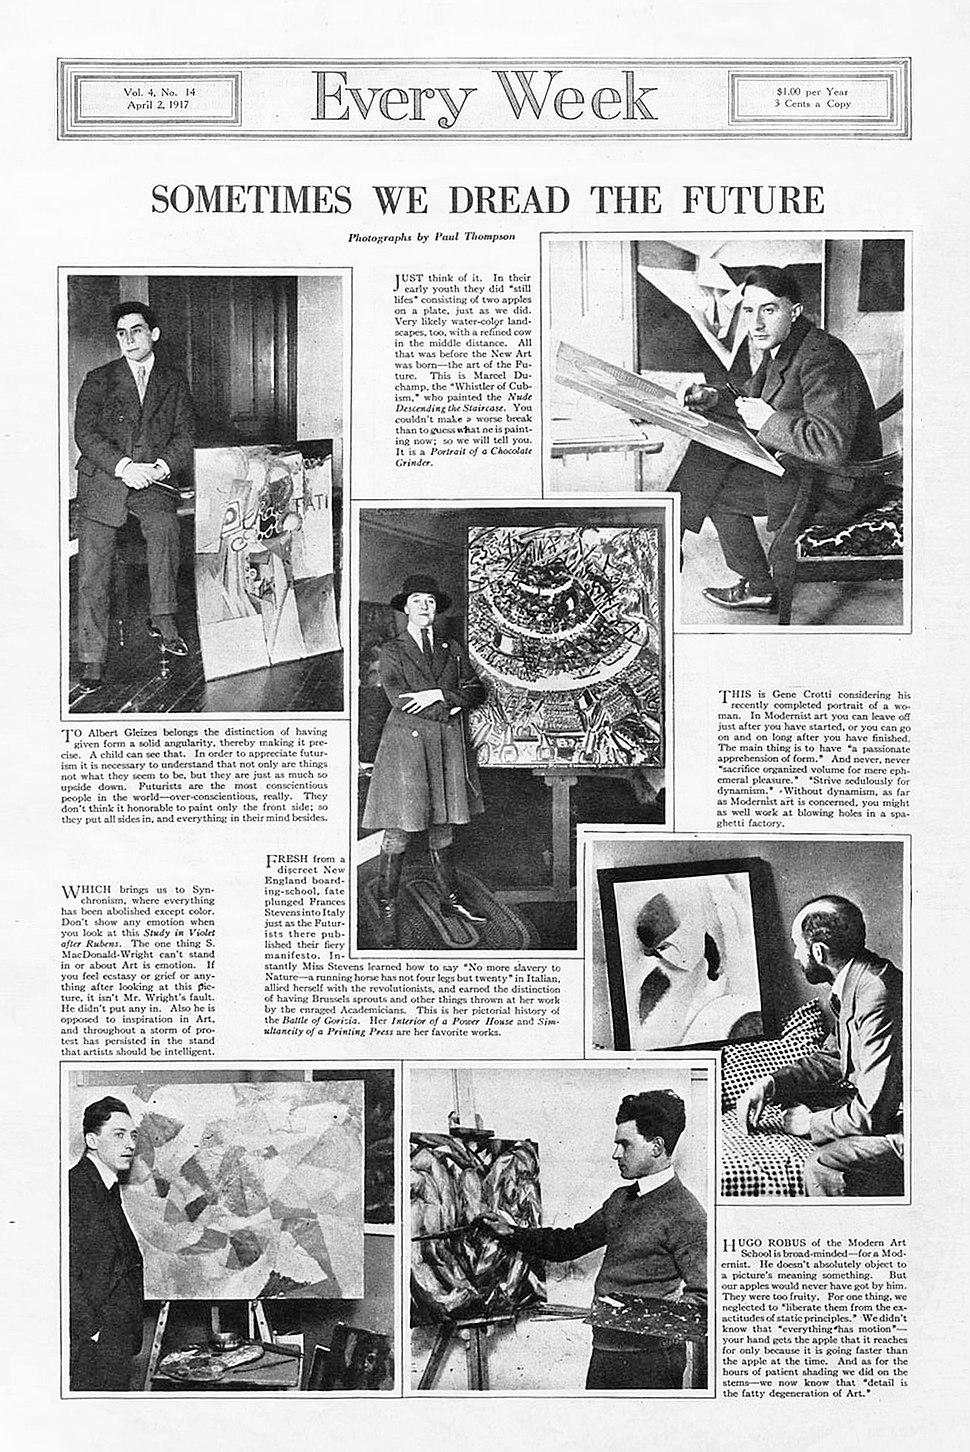 Albert Gleizes, Marcel Duchamp, Jean Crotti, Hugo Robus, Stanton MacDonald-Wright, Frances Simpson Stevens, Every Week, No. 14, April 2, 1917